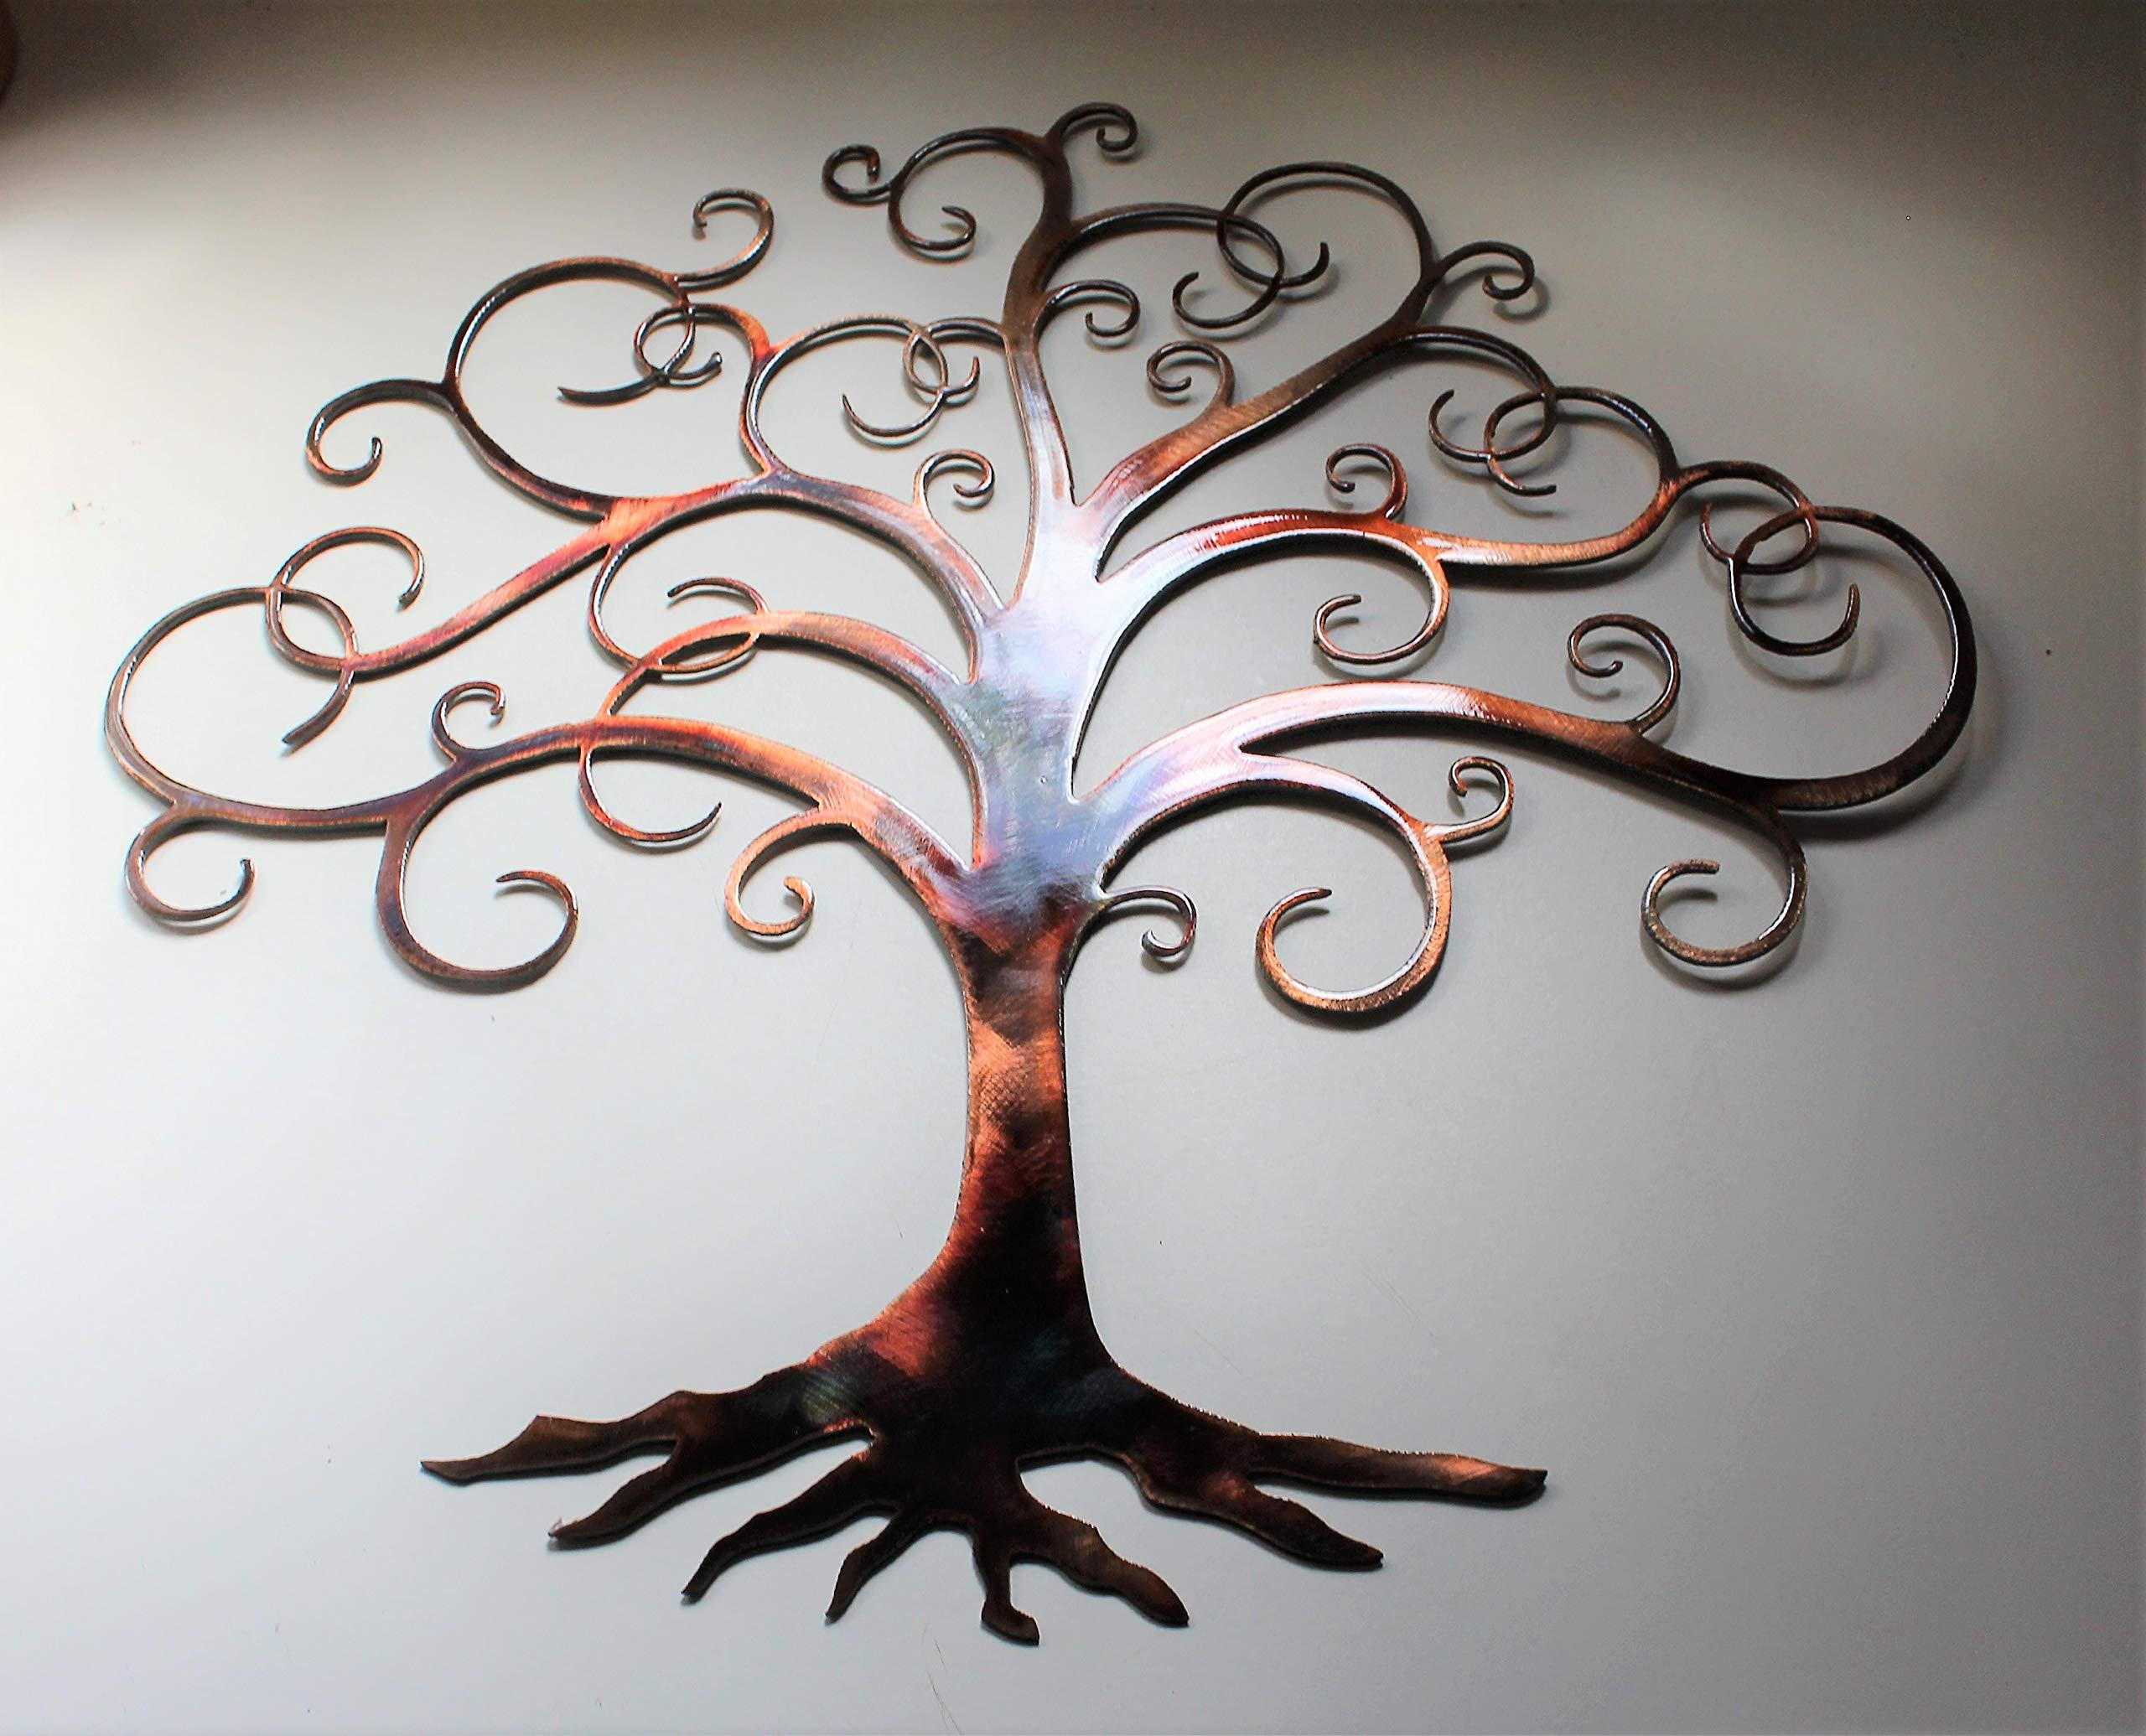 Swirled Tree of Life Metal Wall Art